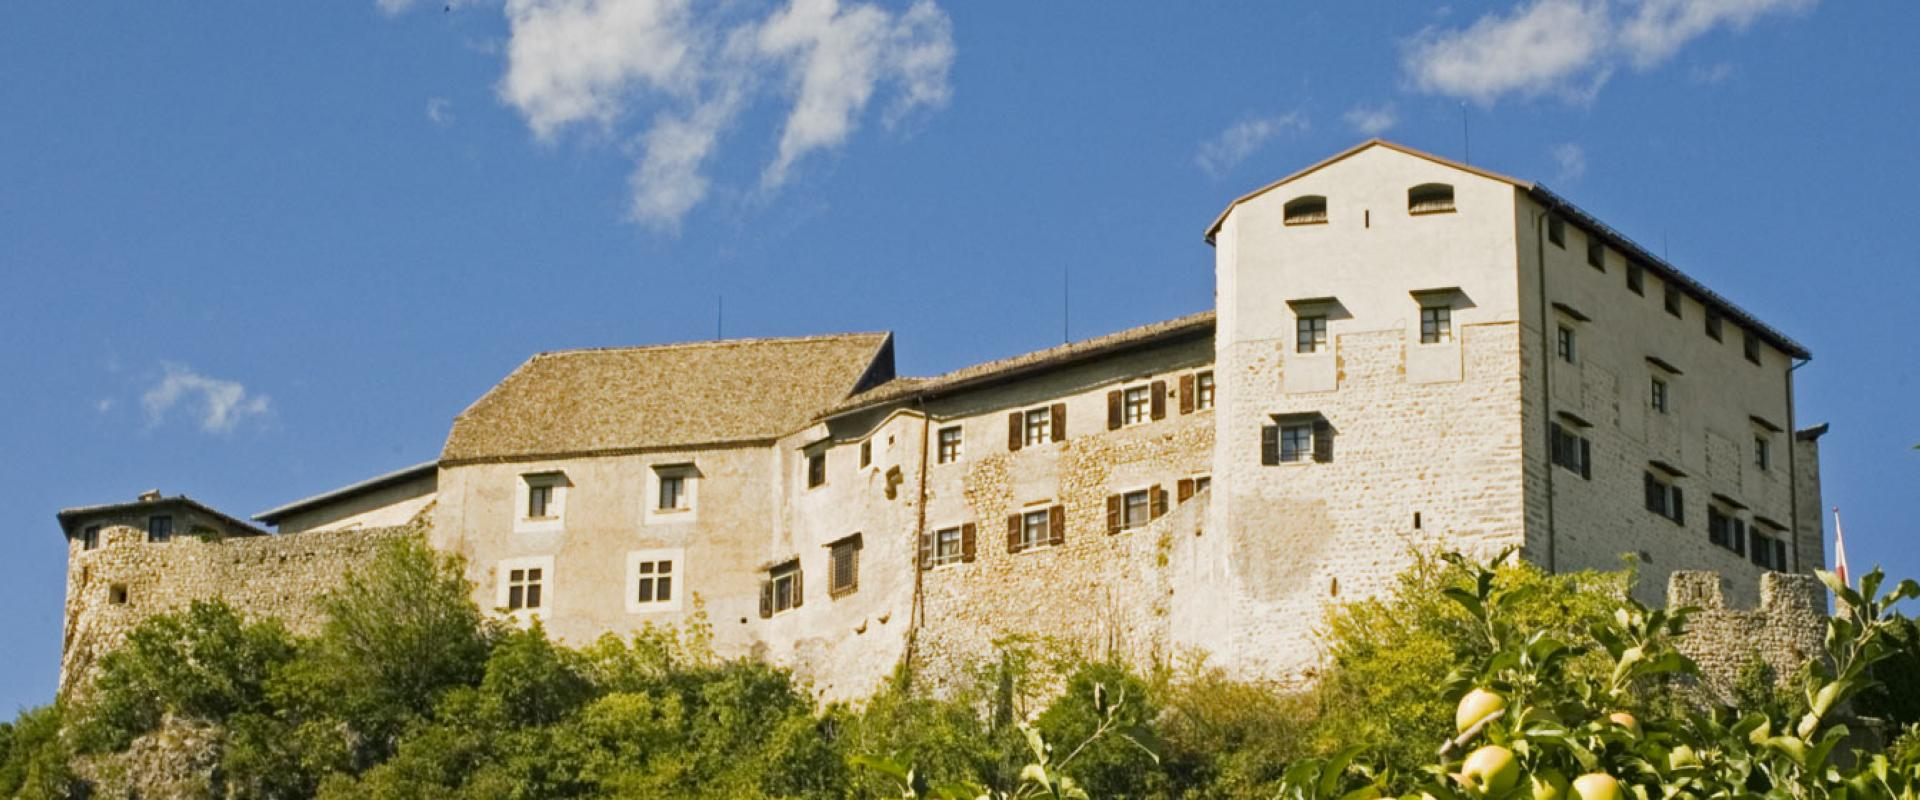 Visit of Stenico castle